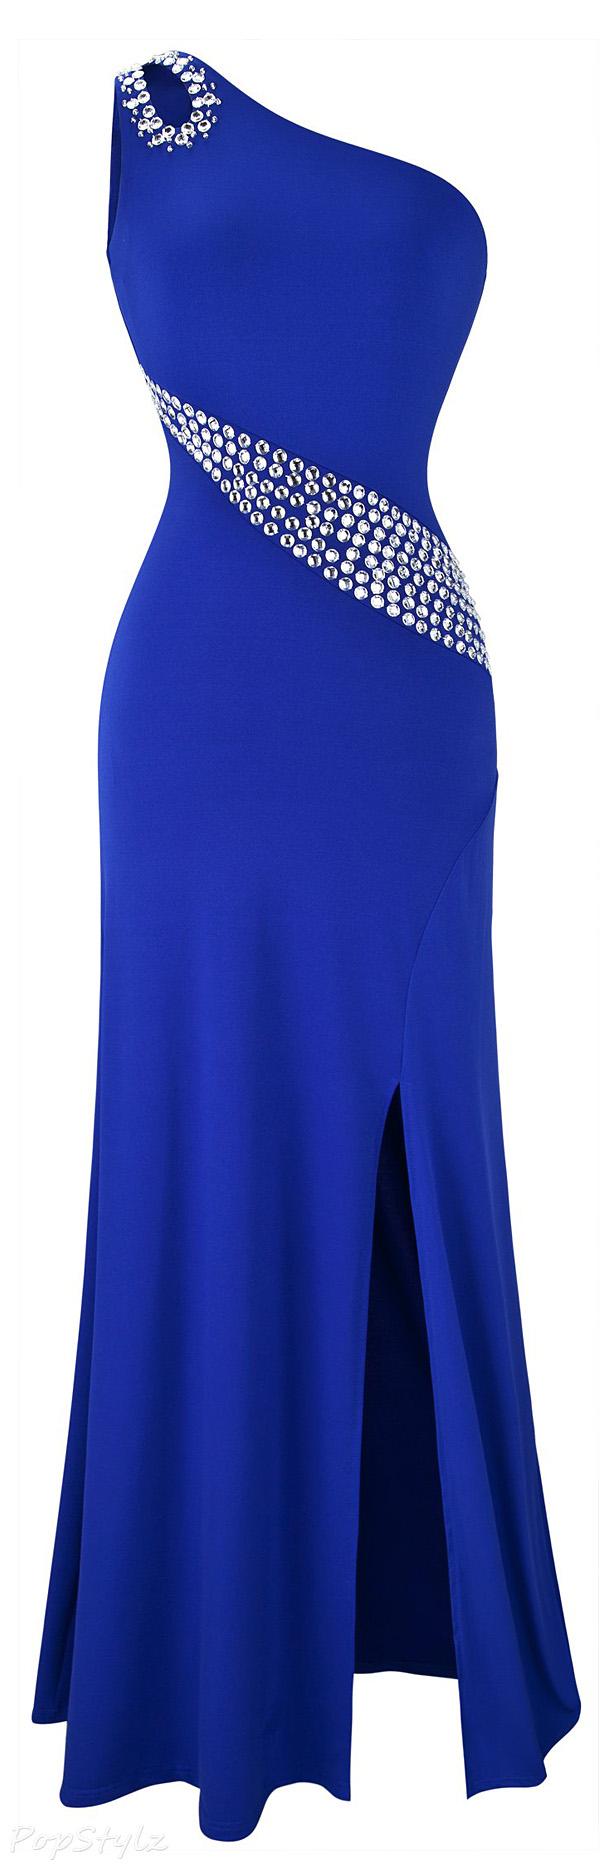 Angel-fashions Rhinestones Single Shoulder Maxi Dress